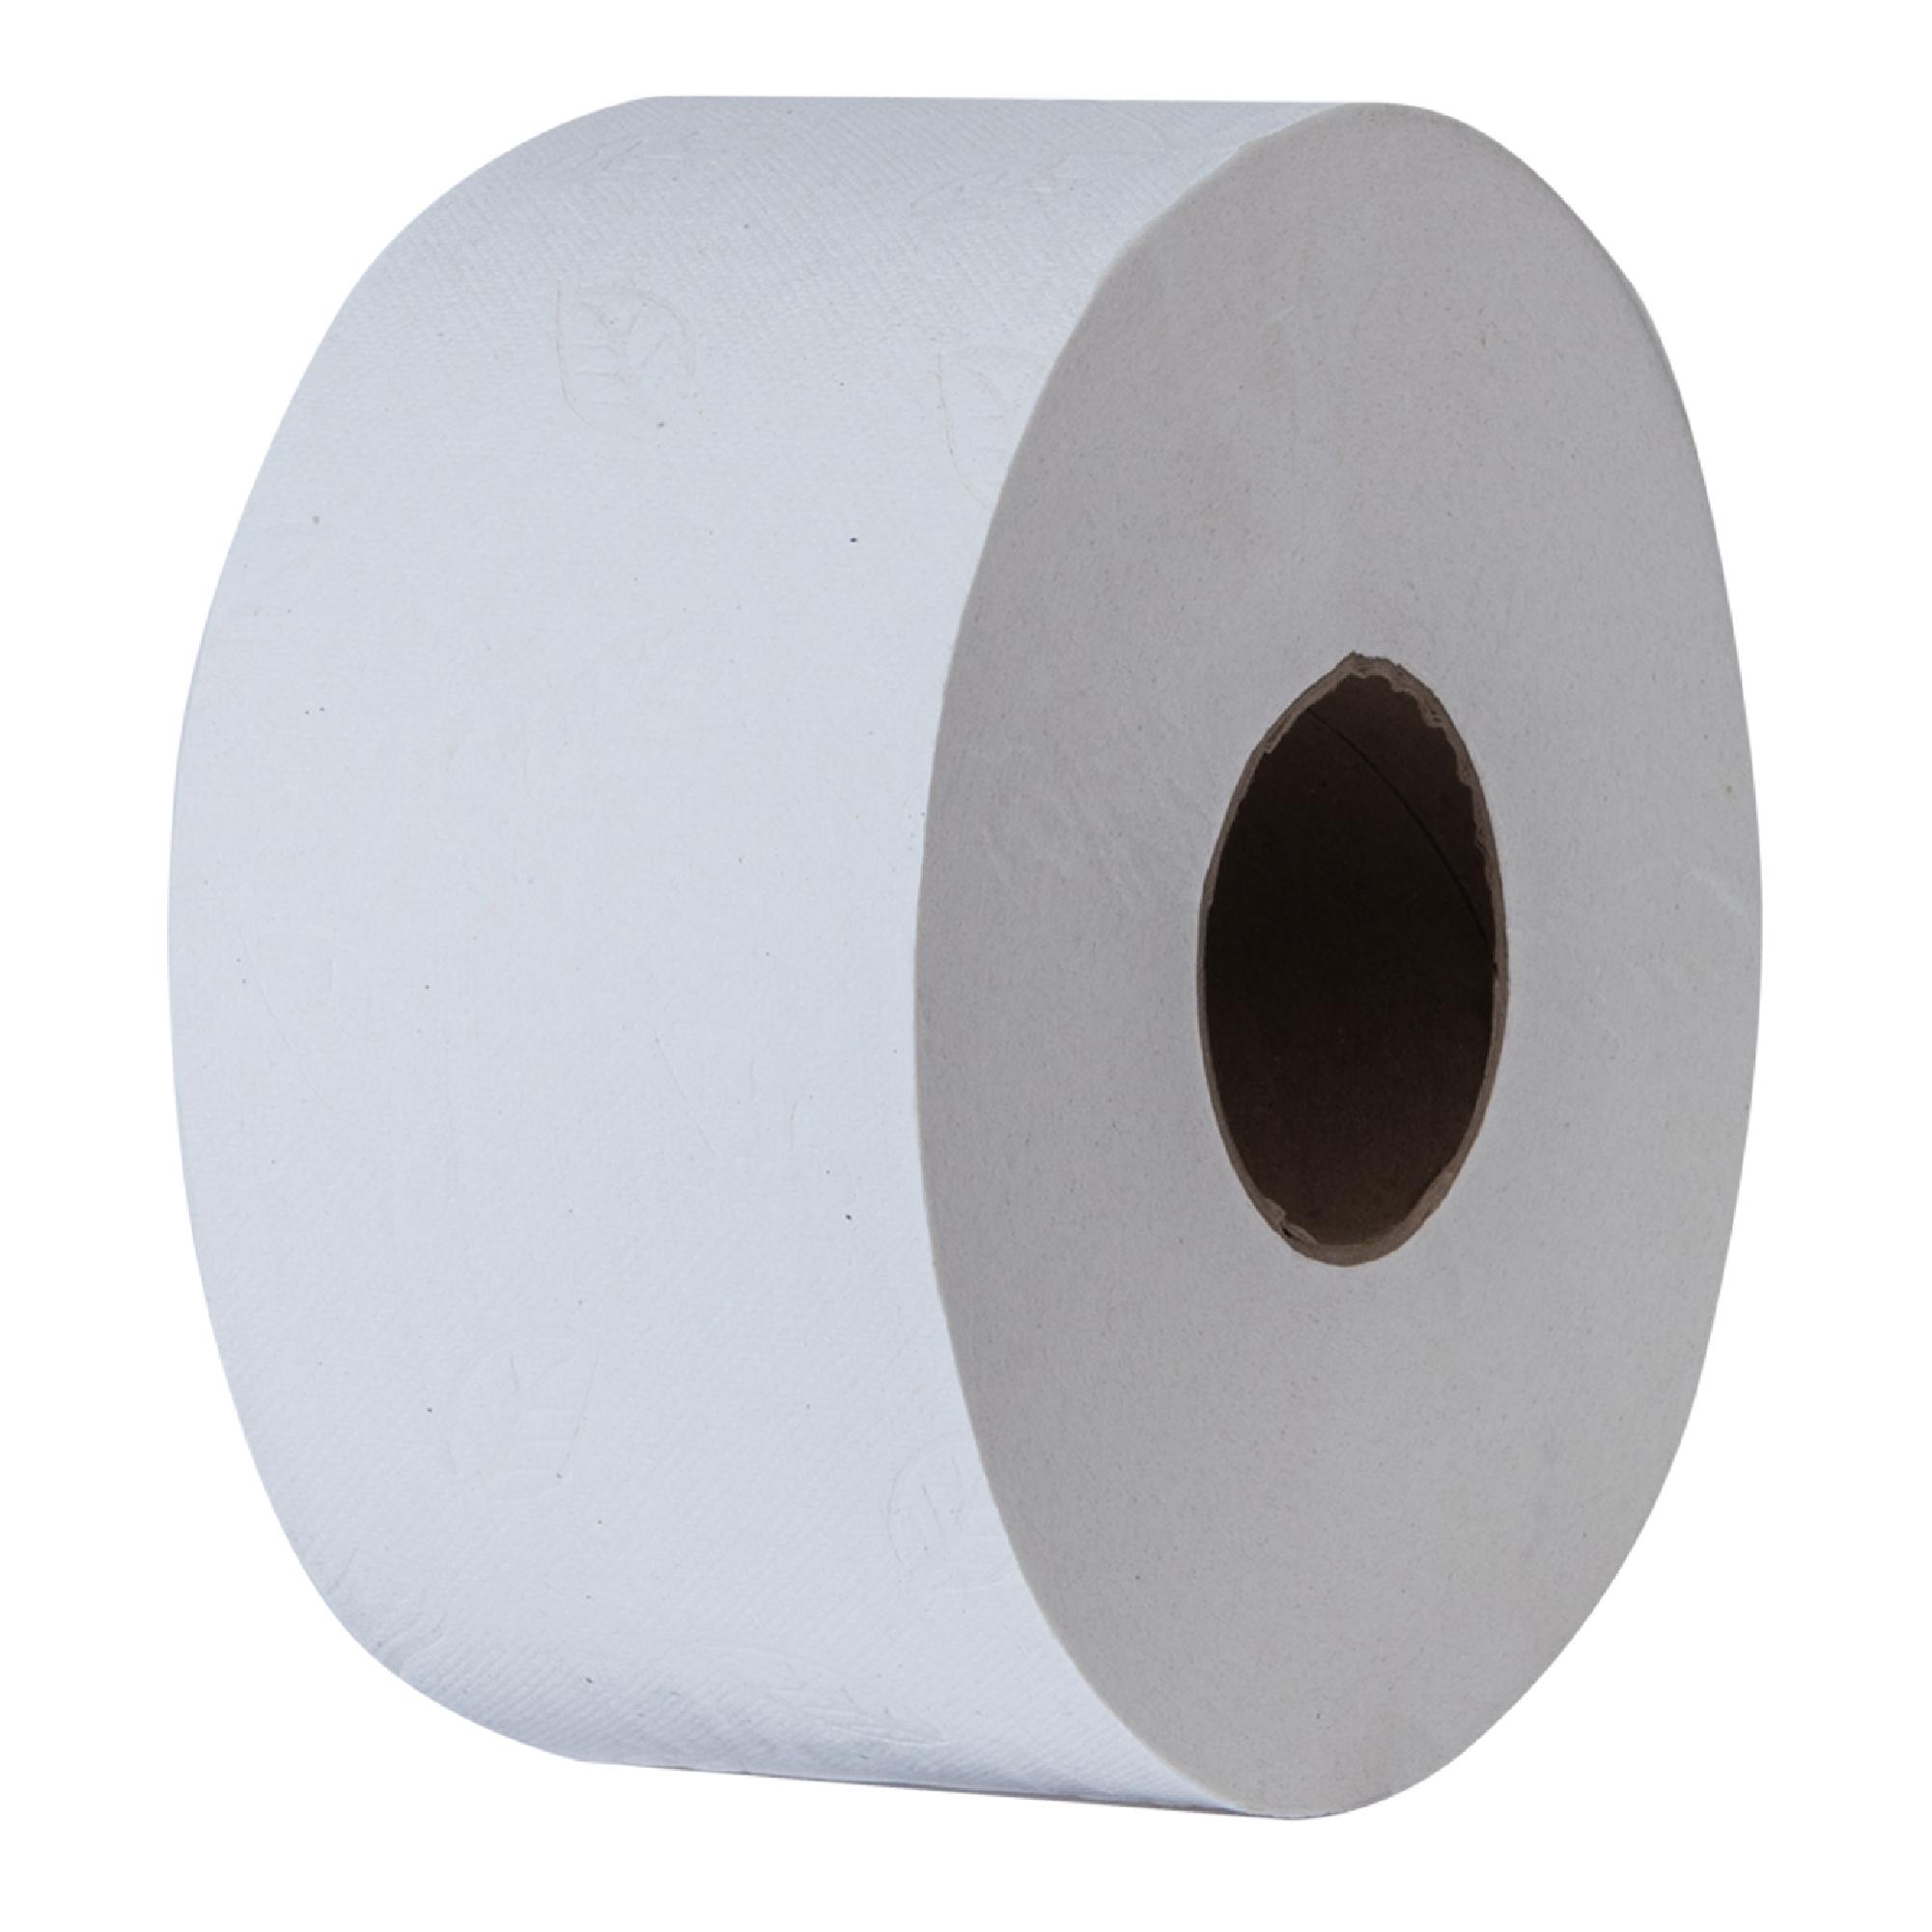 Tork 700165 Higiénico bobina universal institucional hoja doble, paquete con 12 rollos de 200 mts cada uno 2